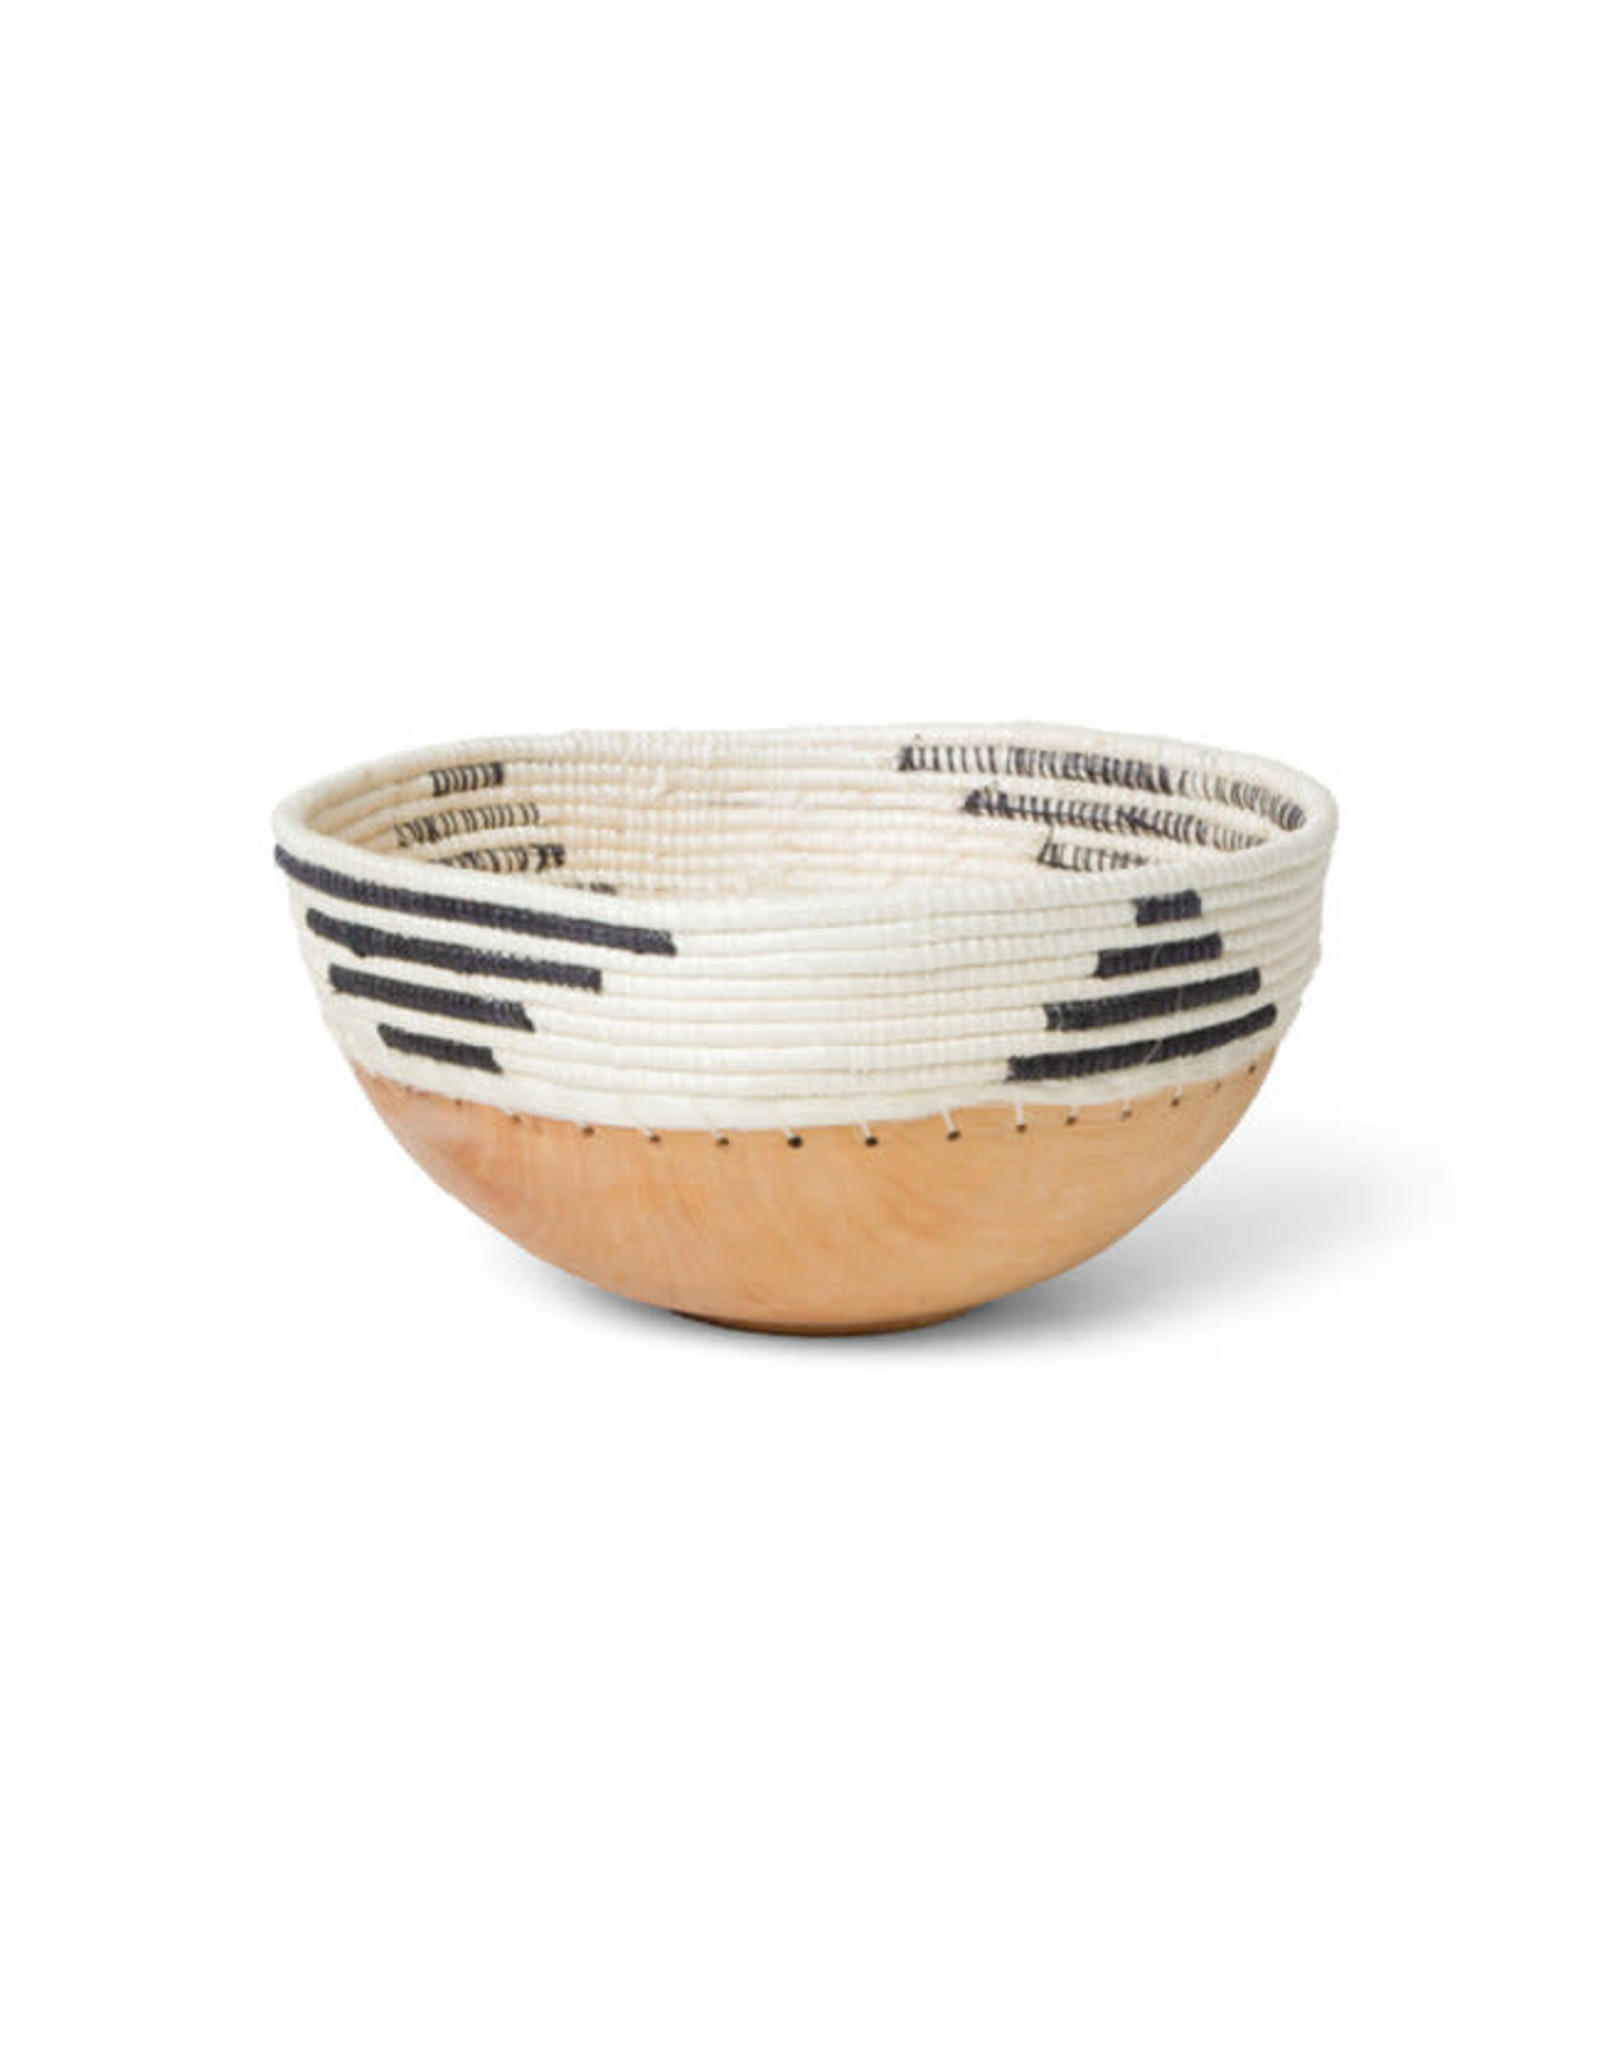 Black + White Patterned Wooden Bowl